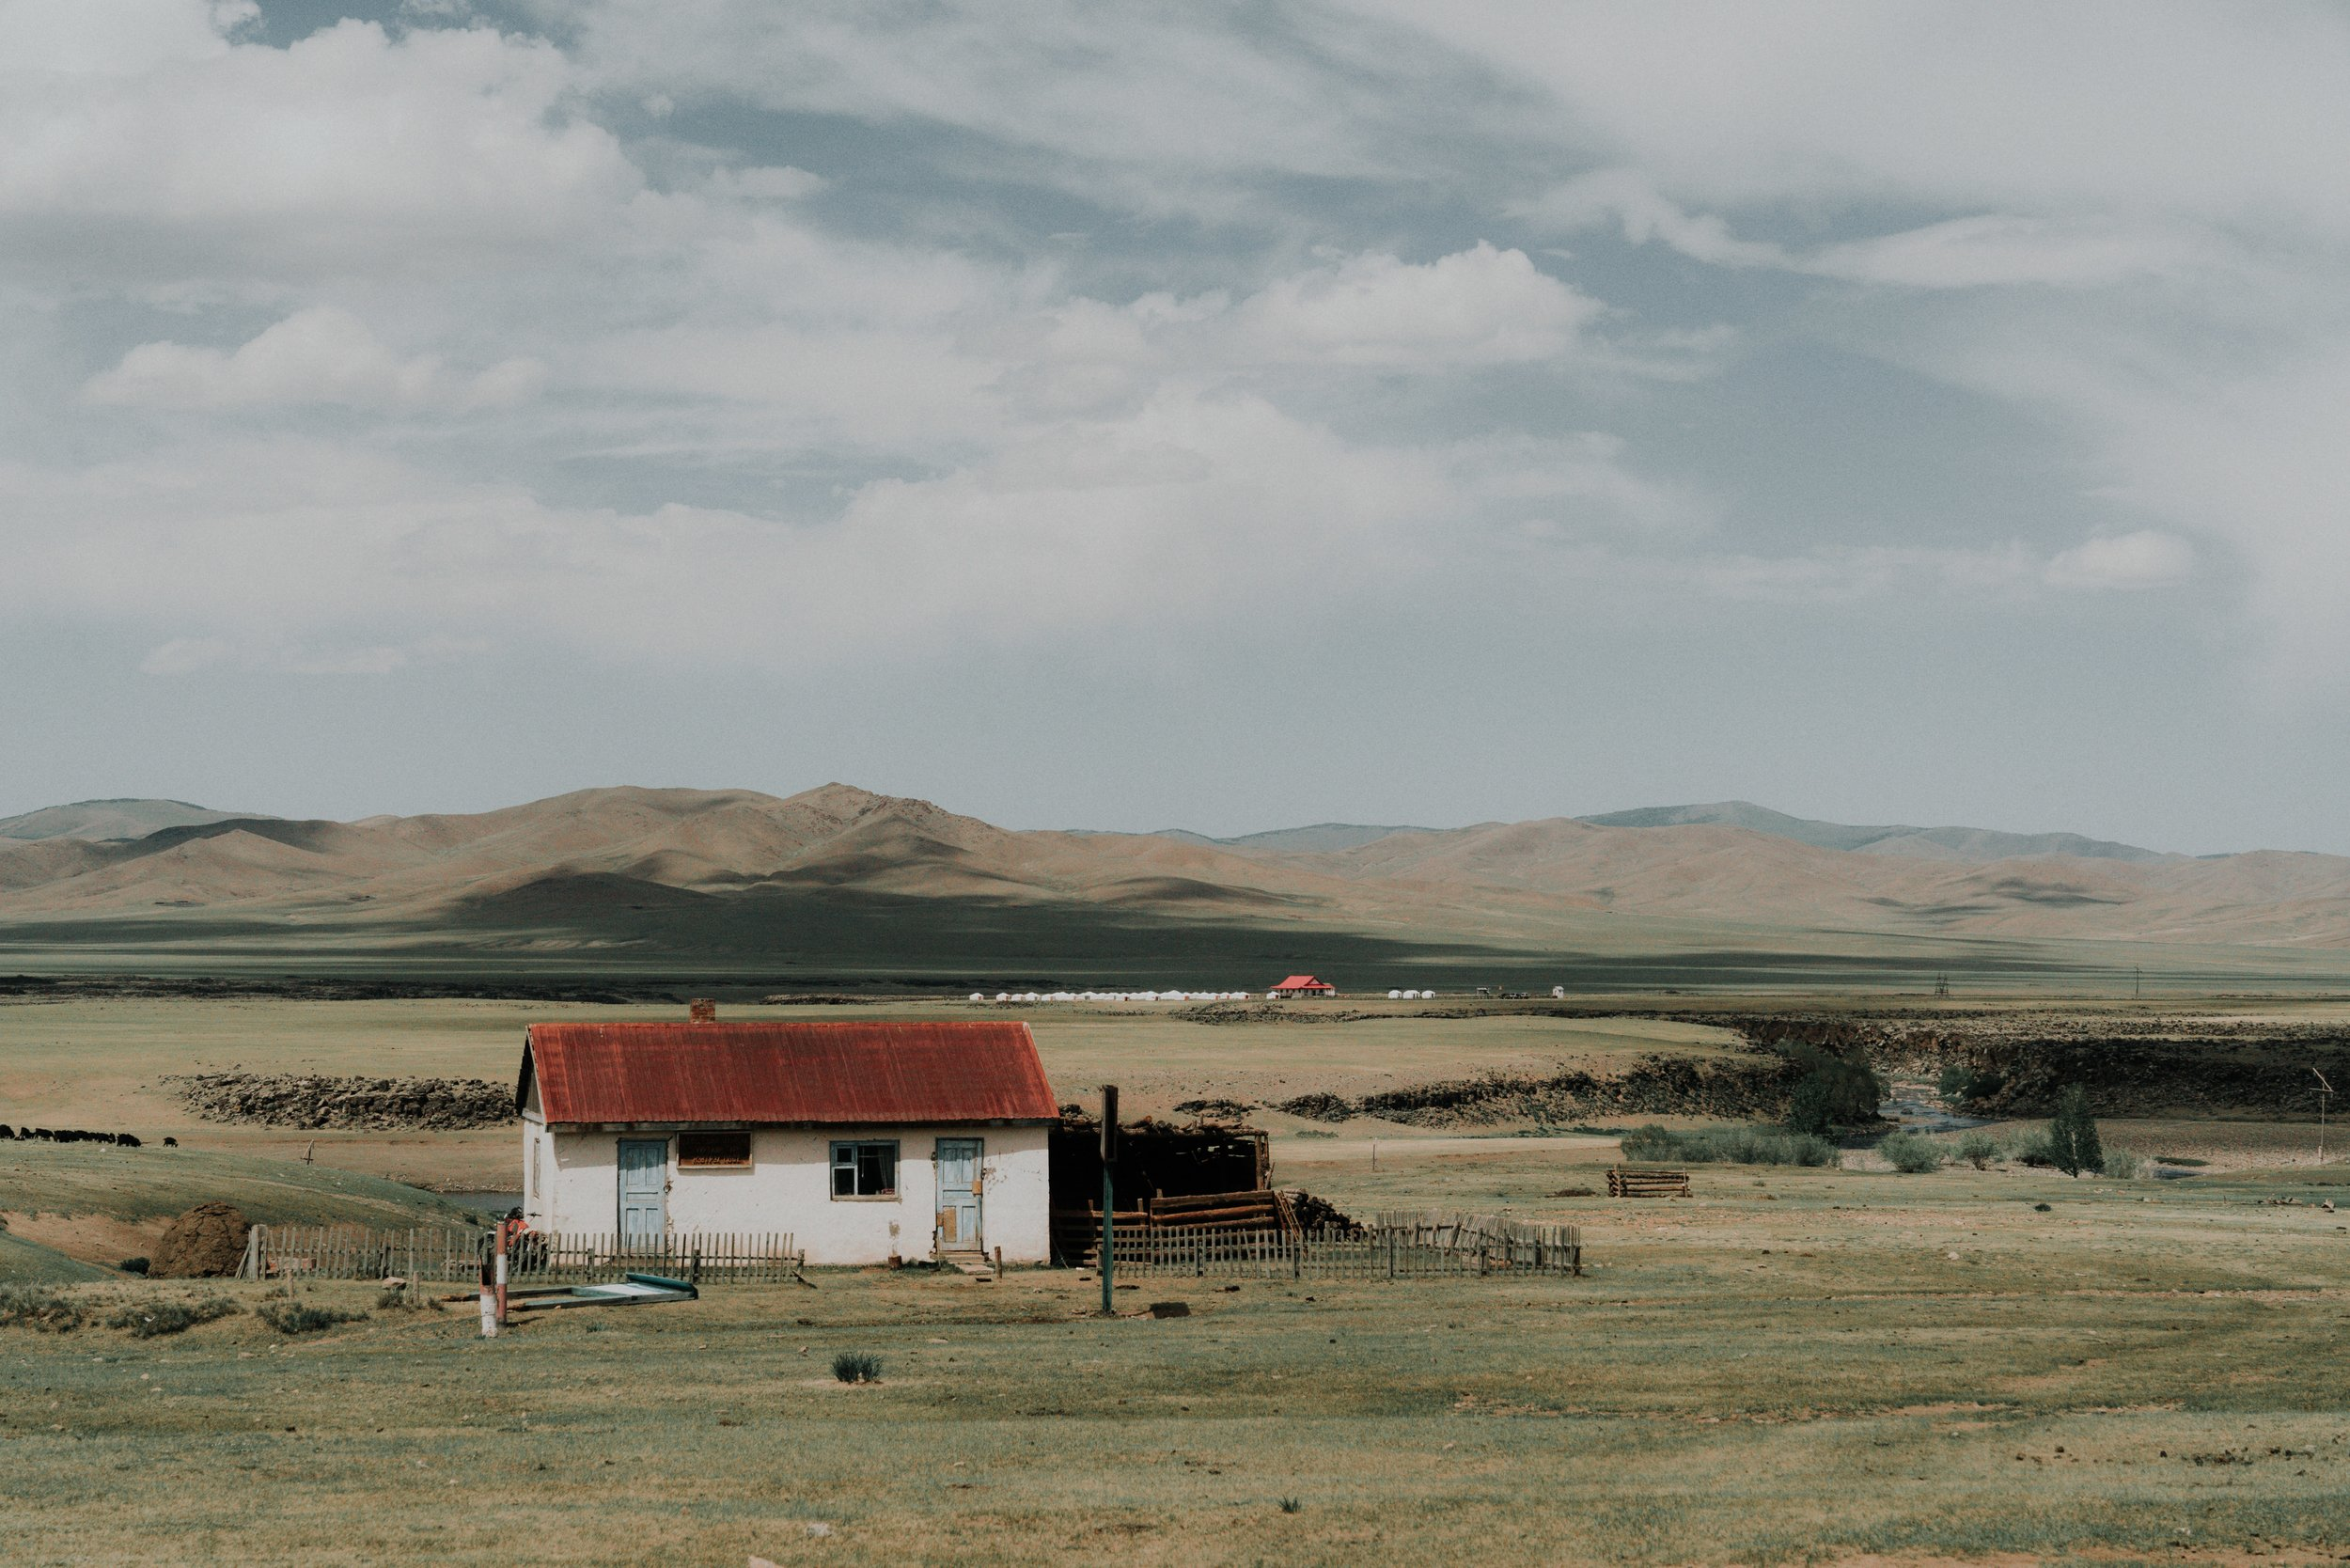 Mongolia_2018 (165 of 403) copy.jpg